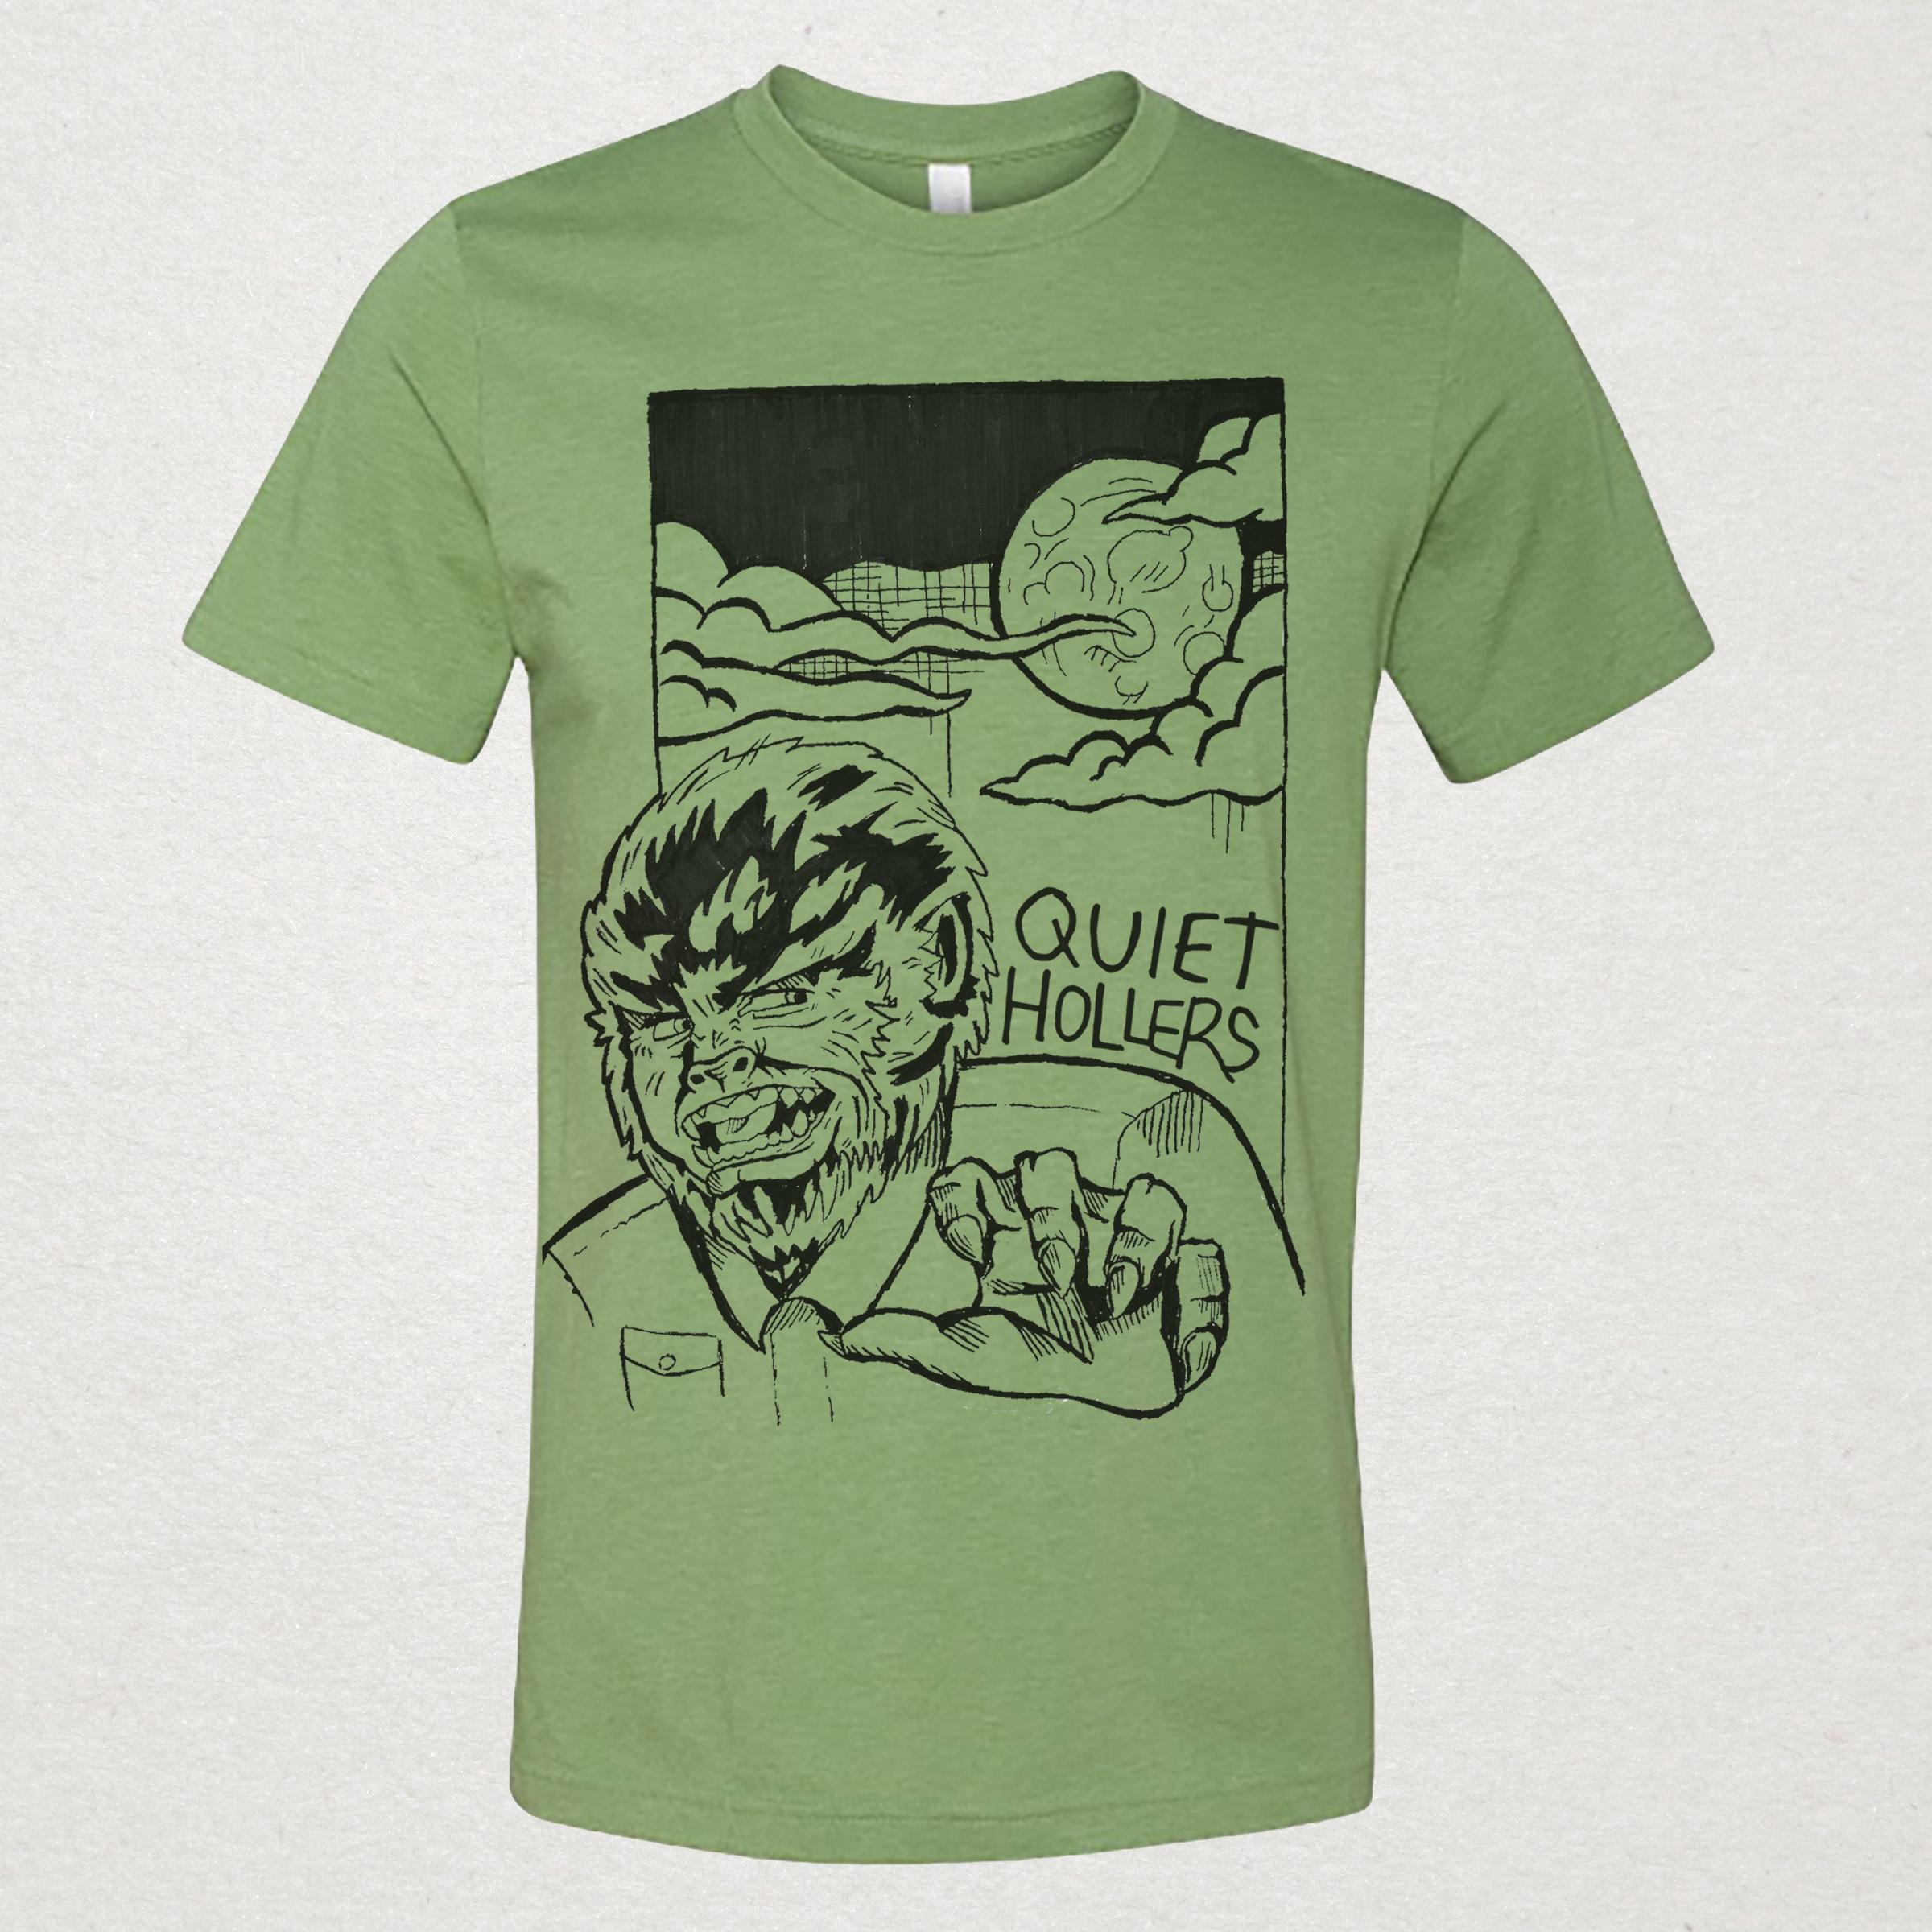 b76157e319 Werewolf T-Shirt - Heather Green (pre-order) — Quiet Hollers